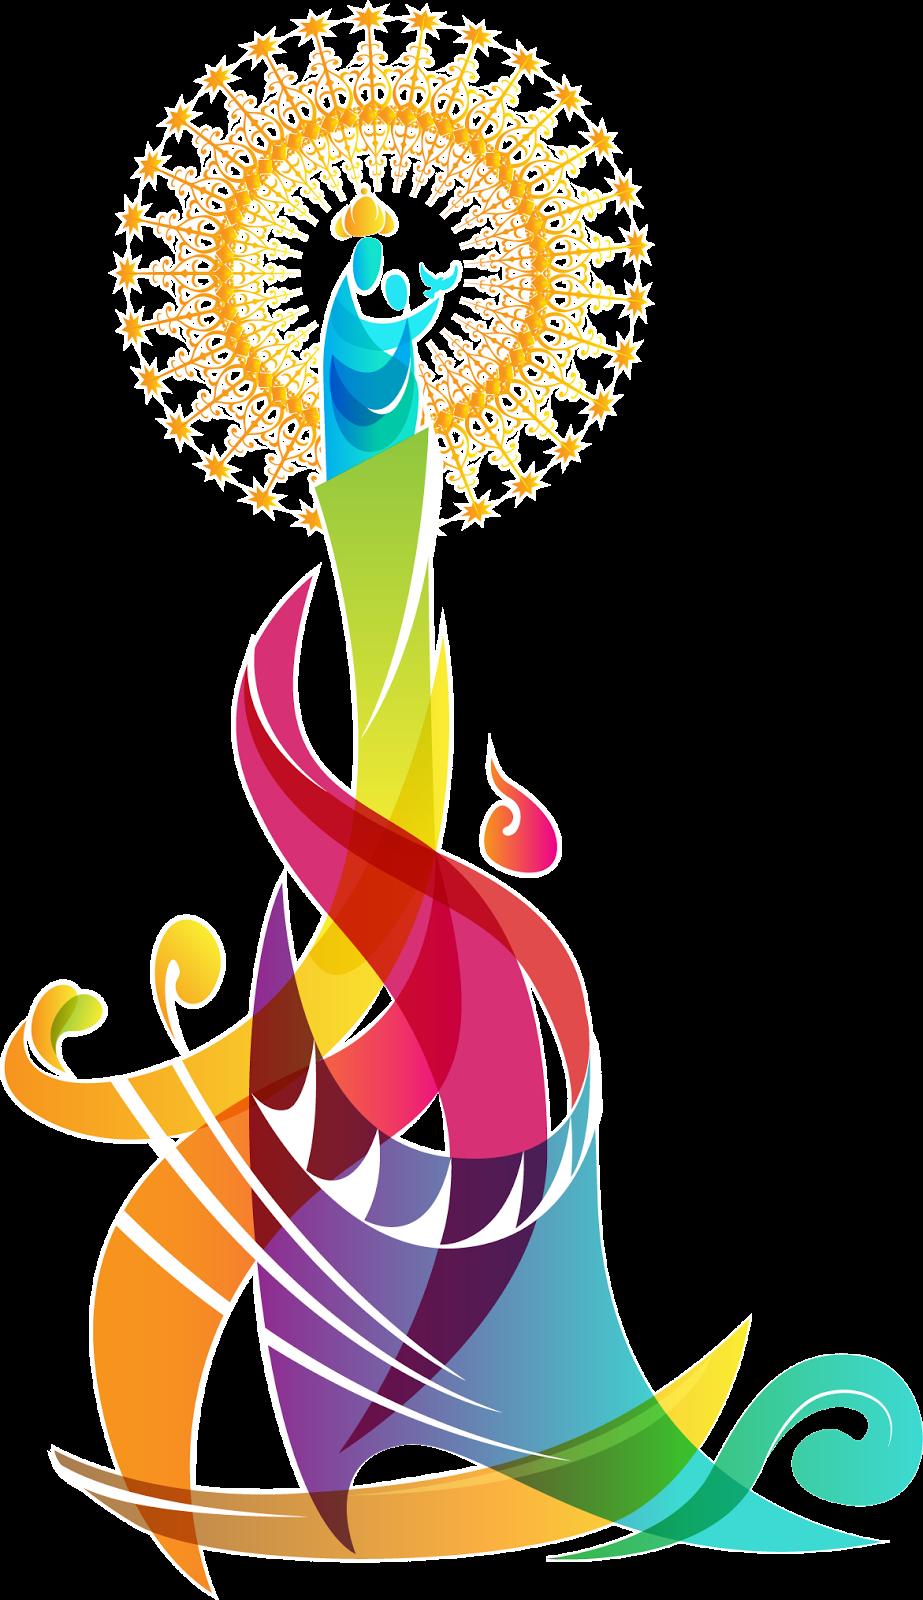 Festival clipart festival philippine. Zamboanga hermosa logo csz